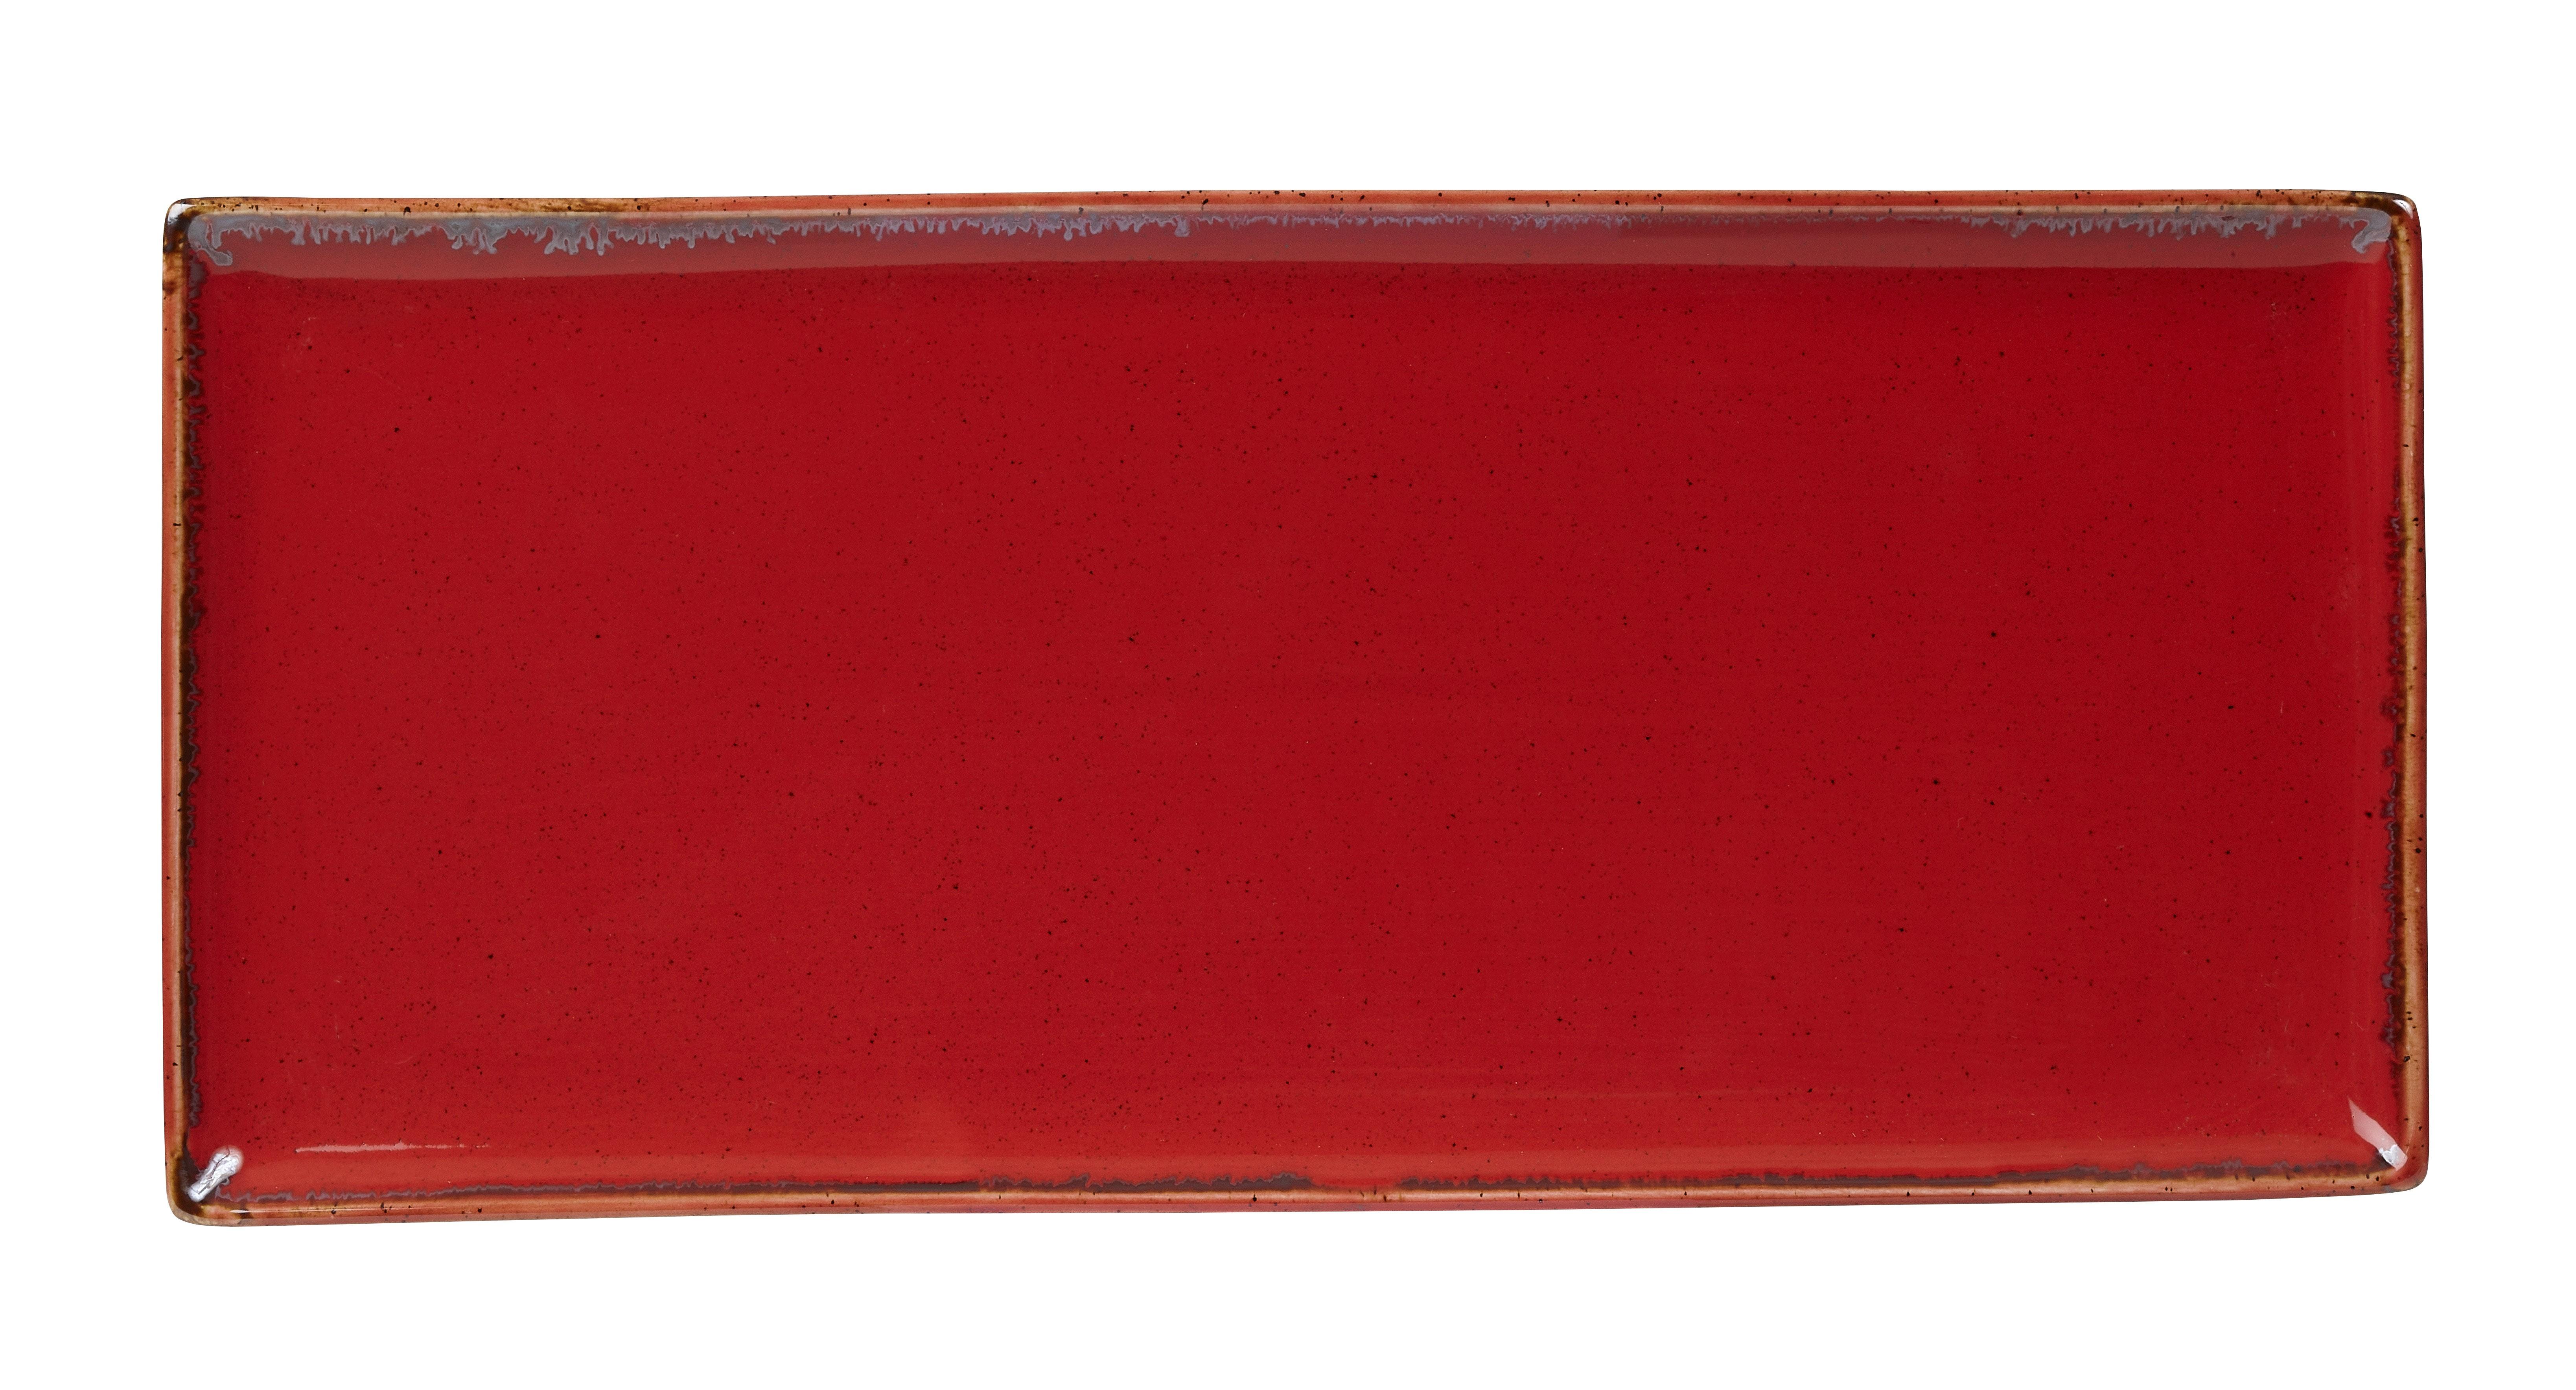 "Magma rectangular Plato 35x15.5cm / 13.75 ""x 6"""